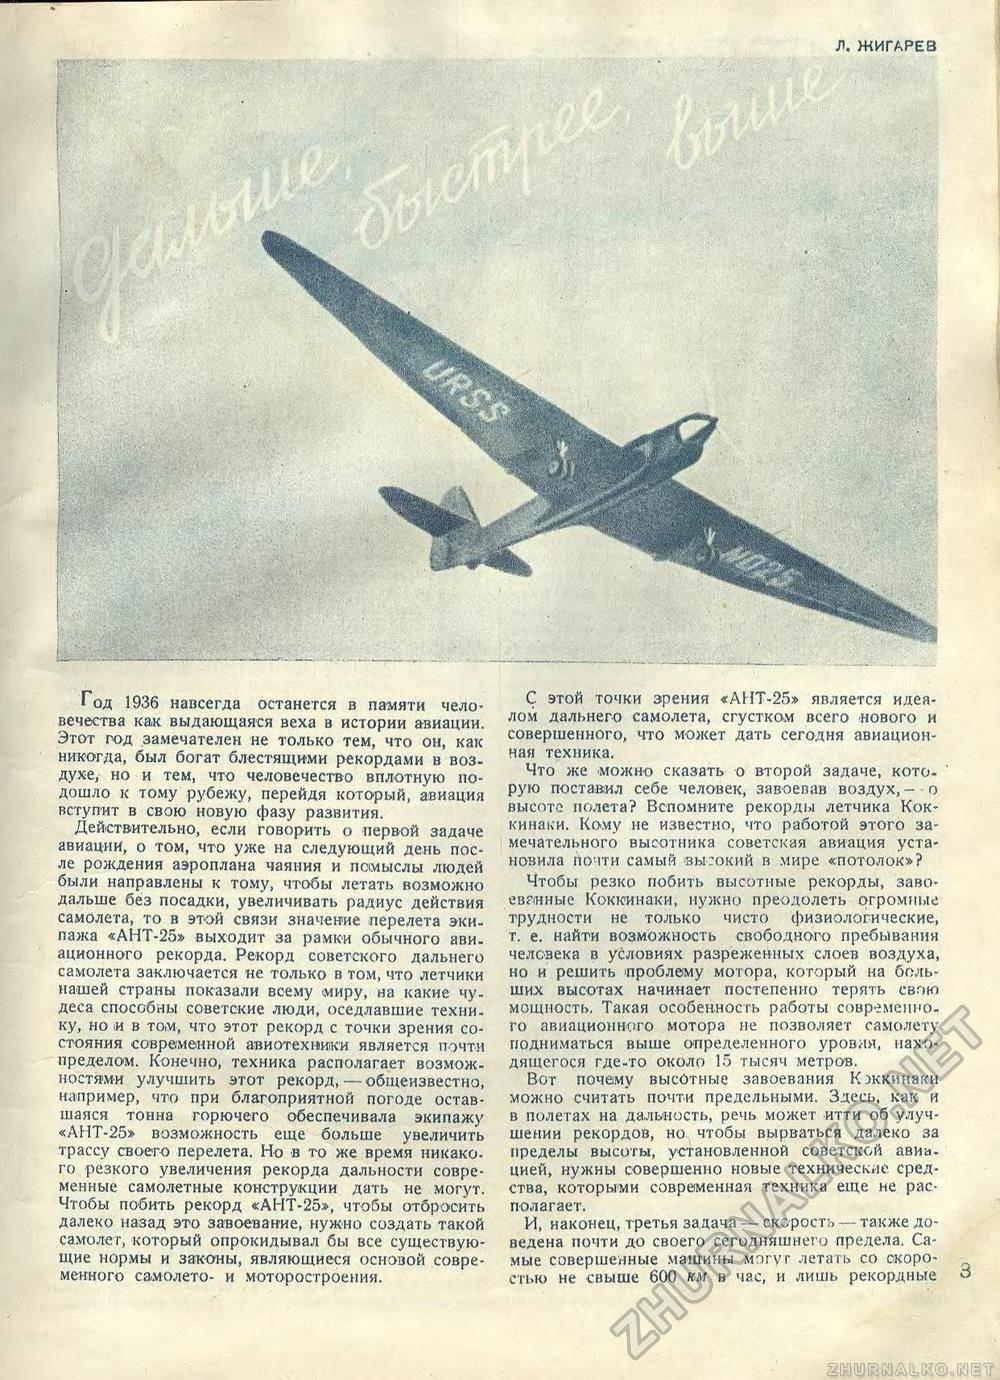 Туполевпс-9 (ант-9). фото. история. характеристики.